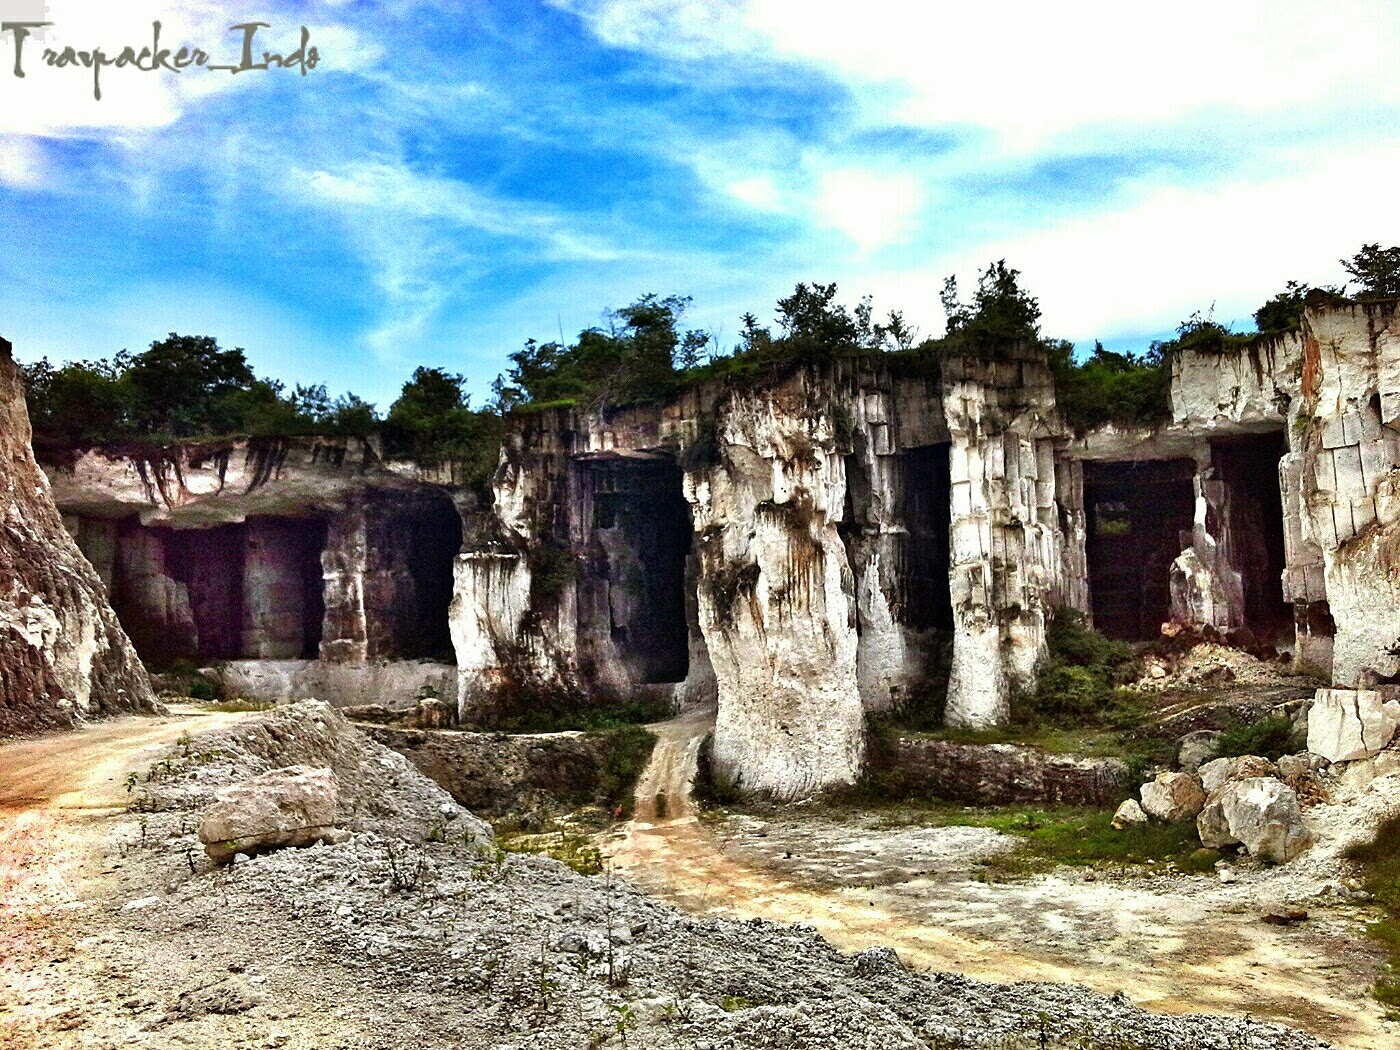 Keindahan Struktur Daerah Galian Tambang Gunung Kapur Sekapuk